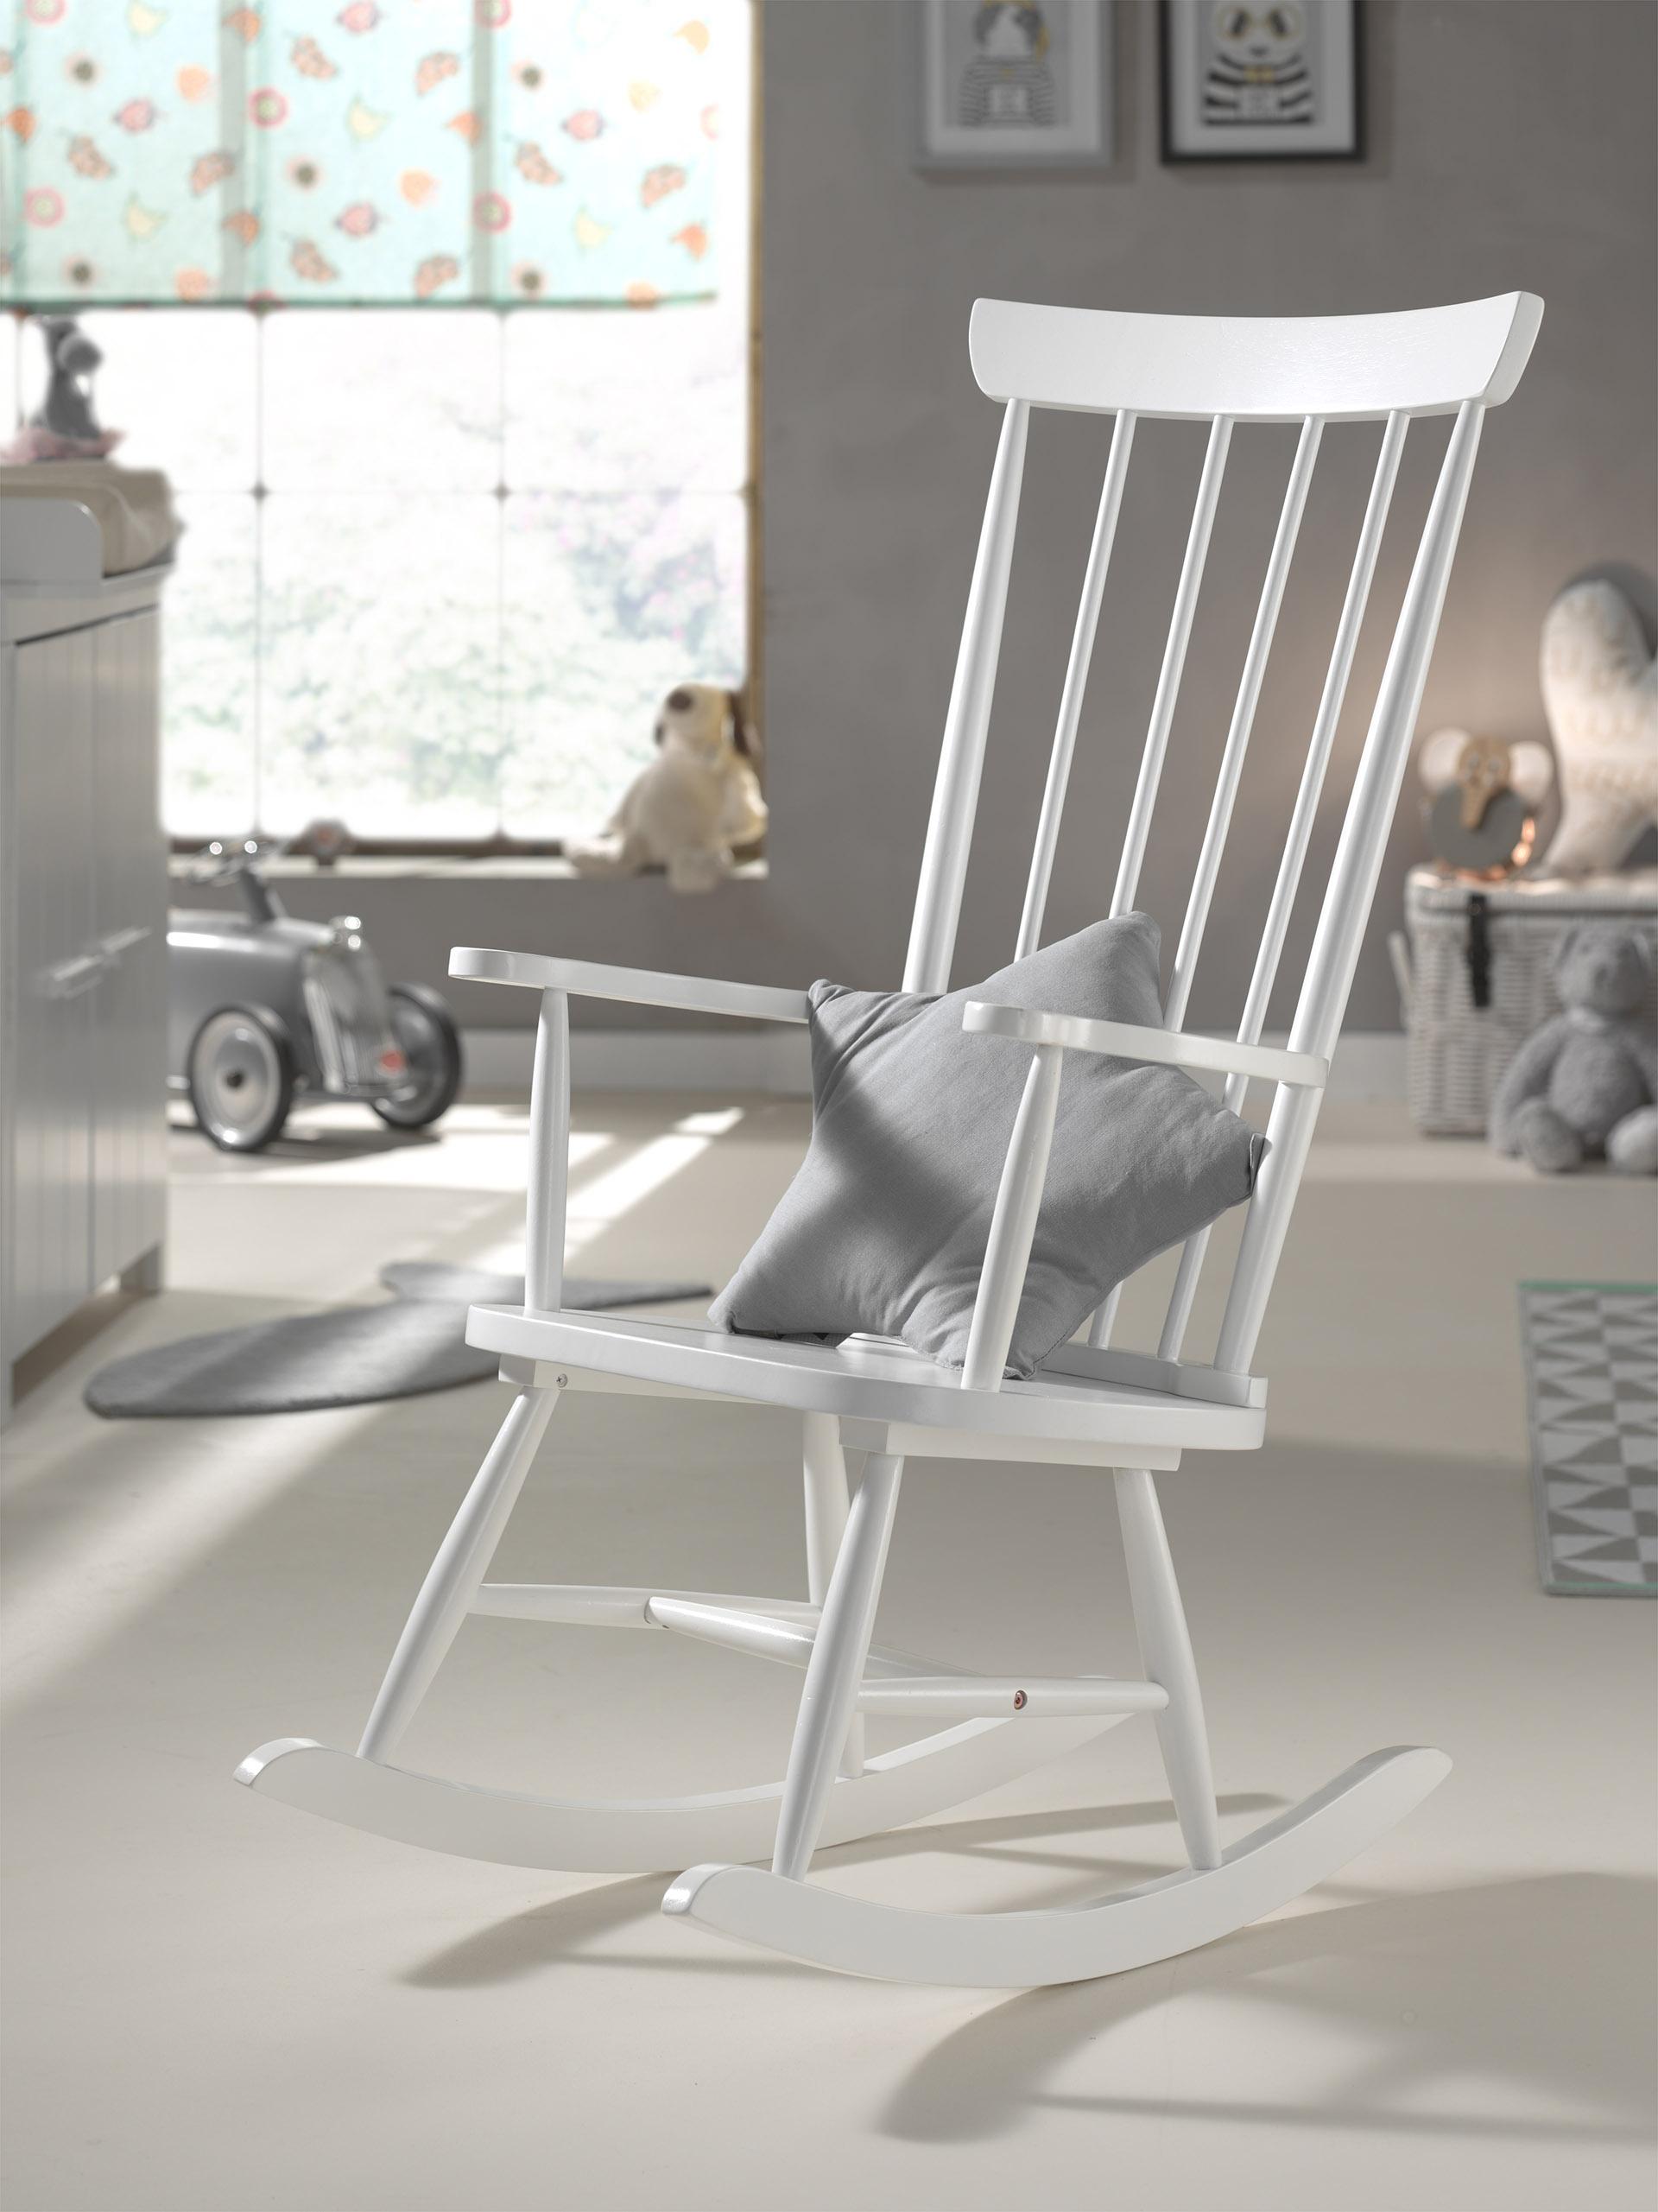 Terrific Rocking Chair Solid Wood White Download Free Architecture Designs Scobabritishbridgeorg